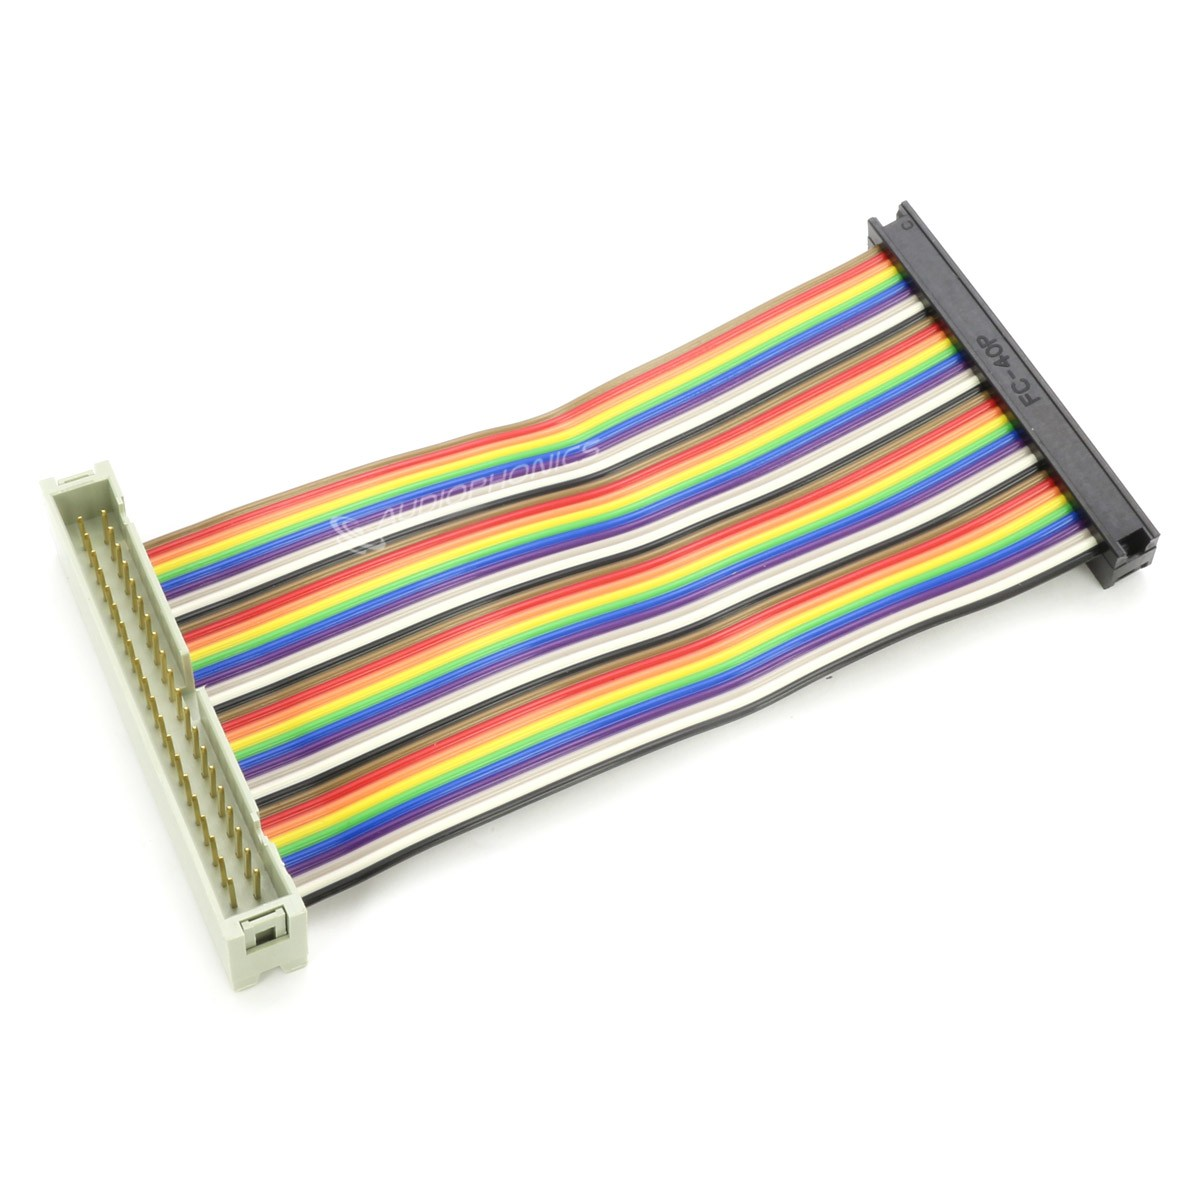 Male / Female Extension GPIO 40 Pins Ribbon Cable for Raspberry Pi 2 / 3 10cm